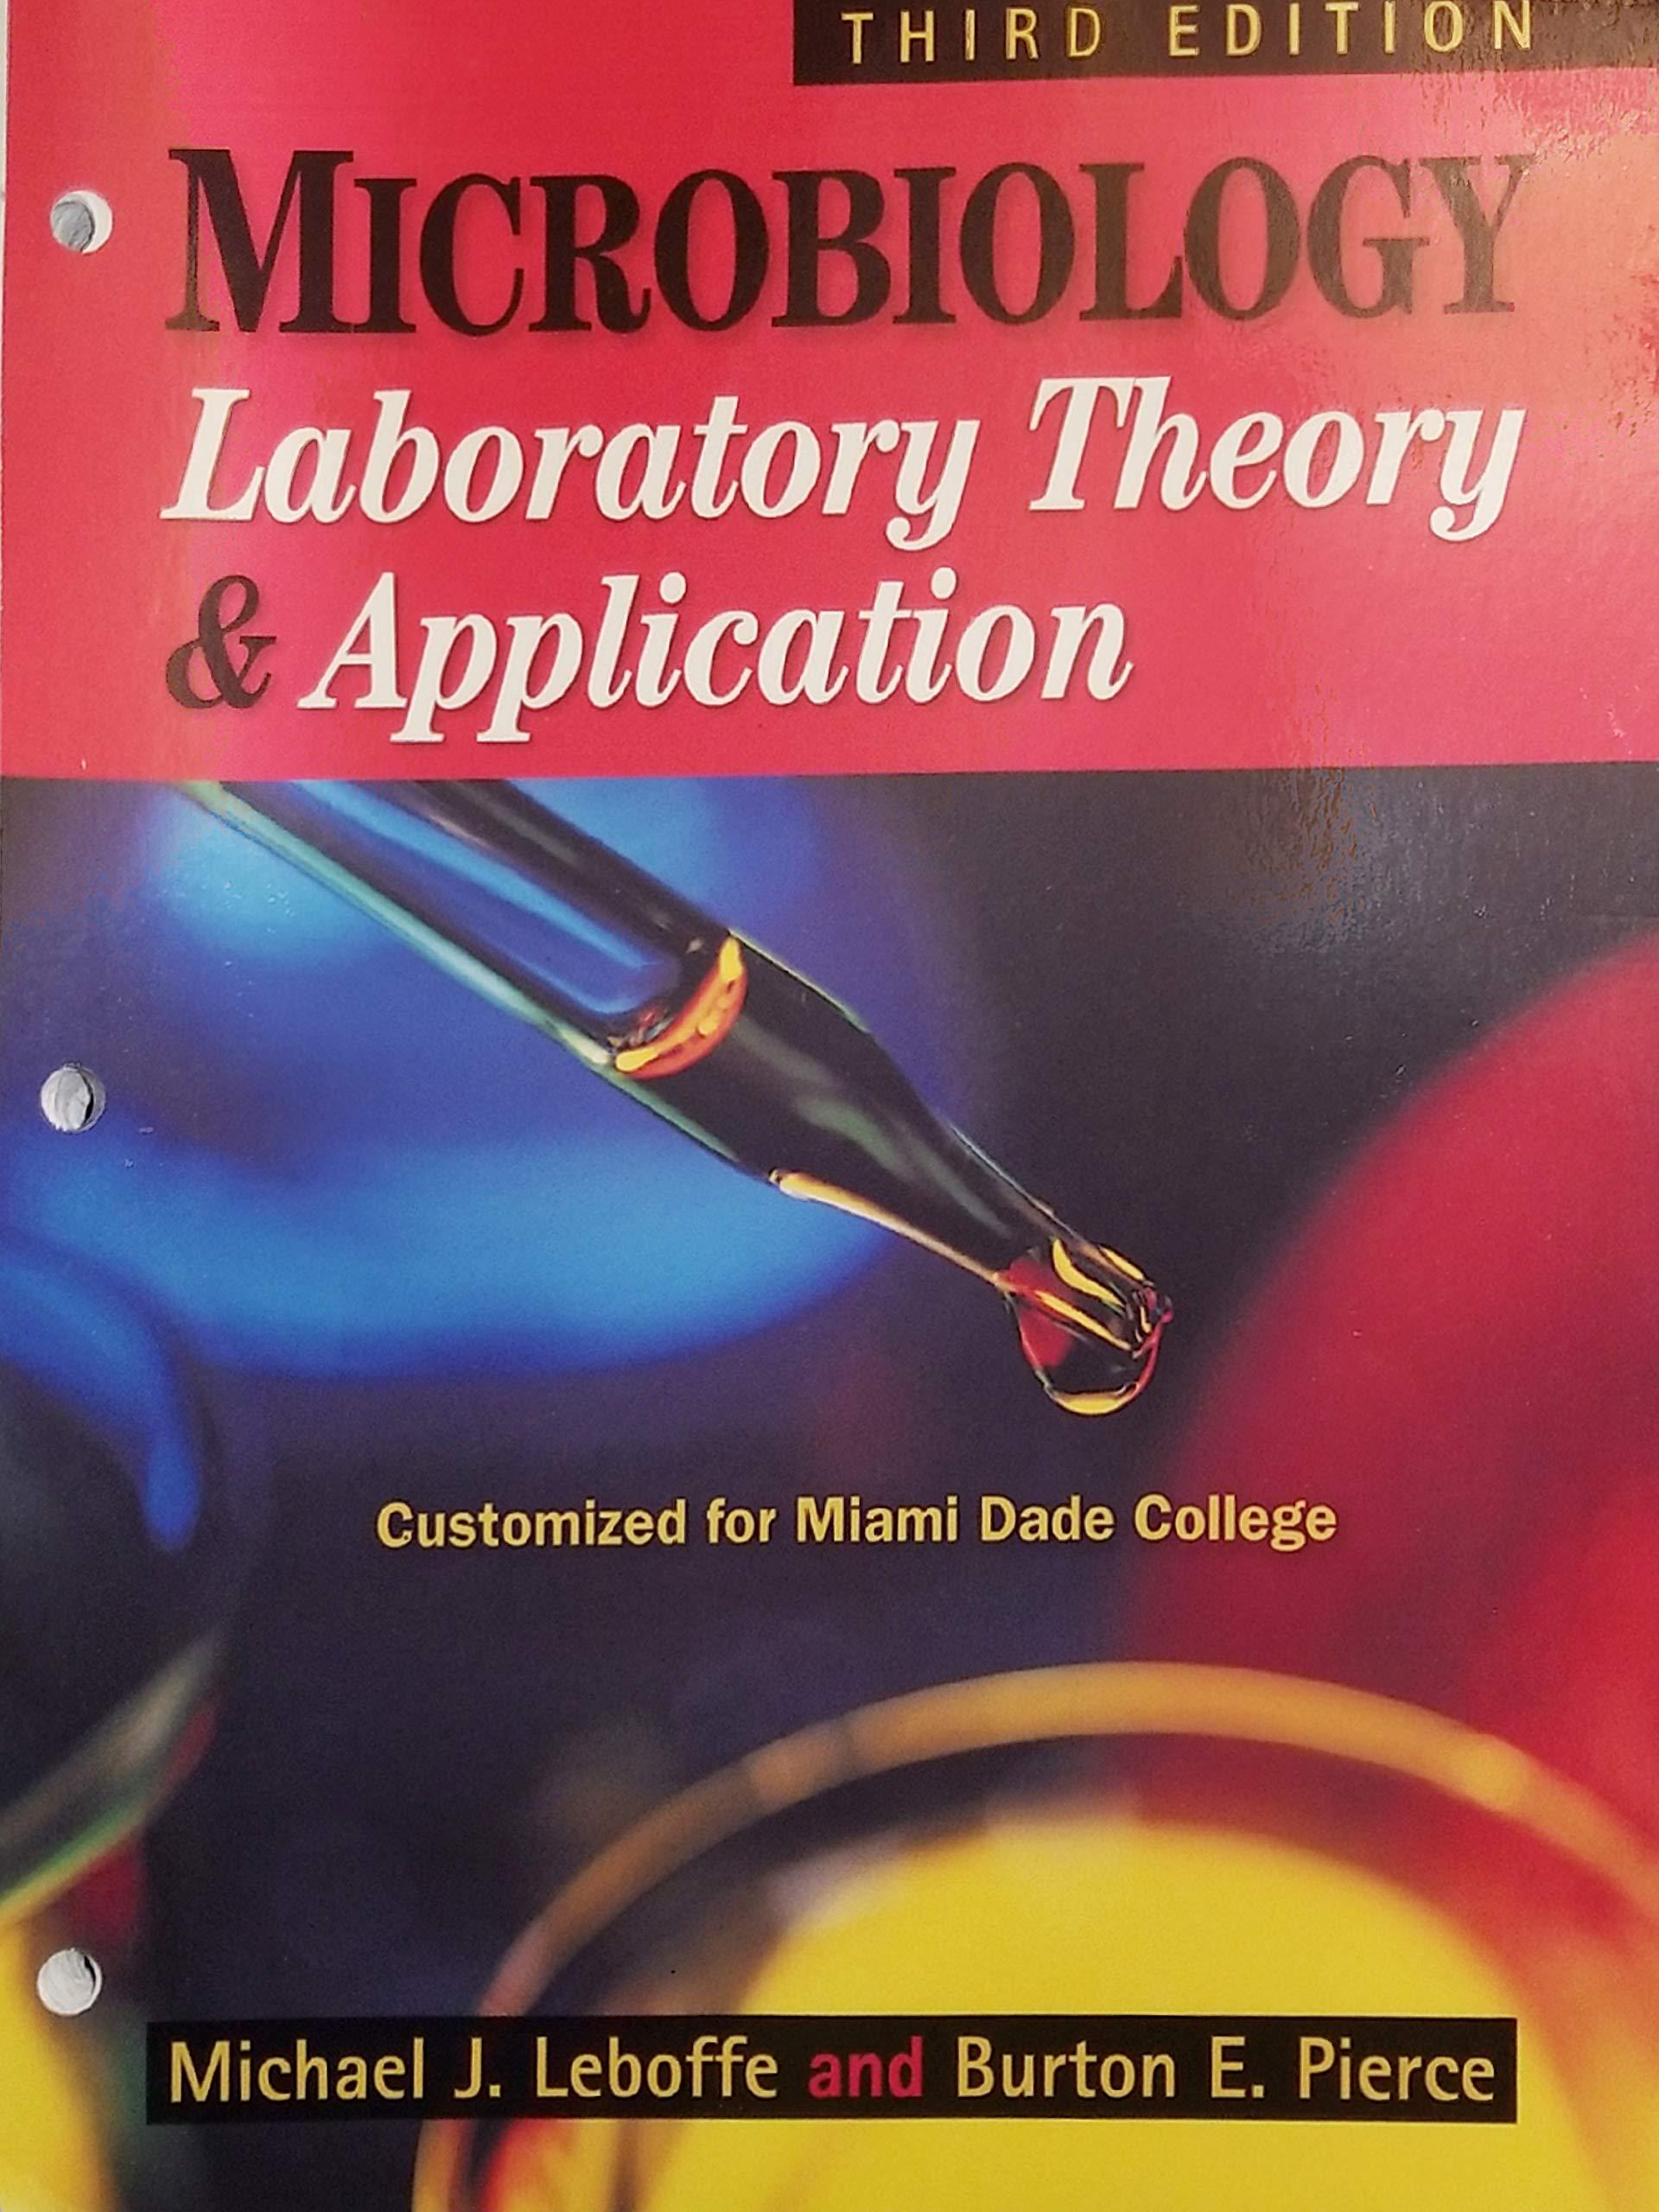 Microbiology Laboratory Theory Application Customized For Miami Dade College Third Edition Michael J Leboffe And Burton E Pierce 9781617316883 Amazon Com Books